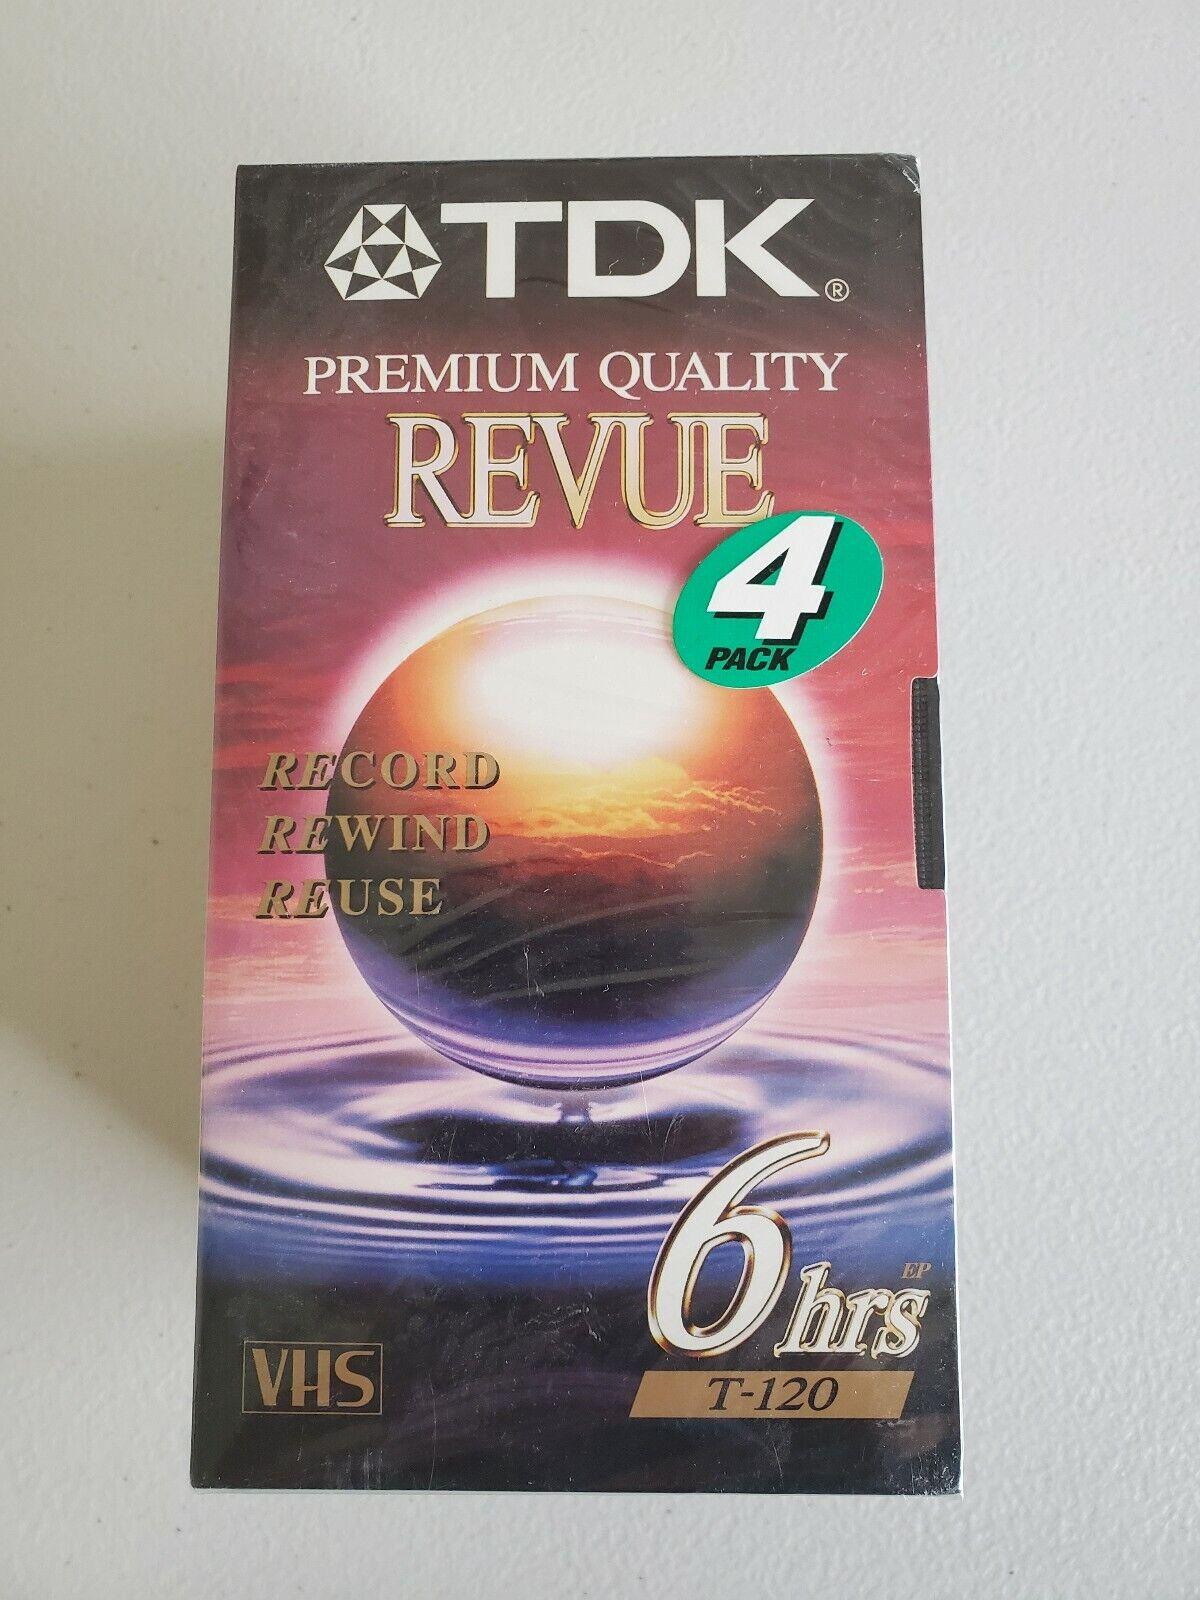 SET OF 3 TDK T-120 REVUE STANDARDS GRADE VHS VIDEO CASSETTE TAPE 6 HRS